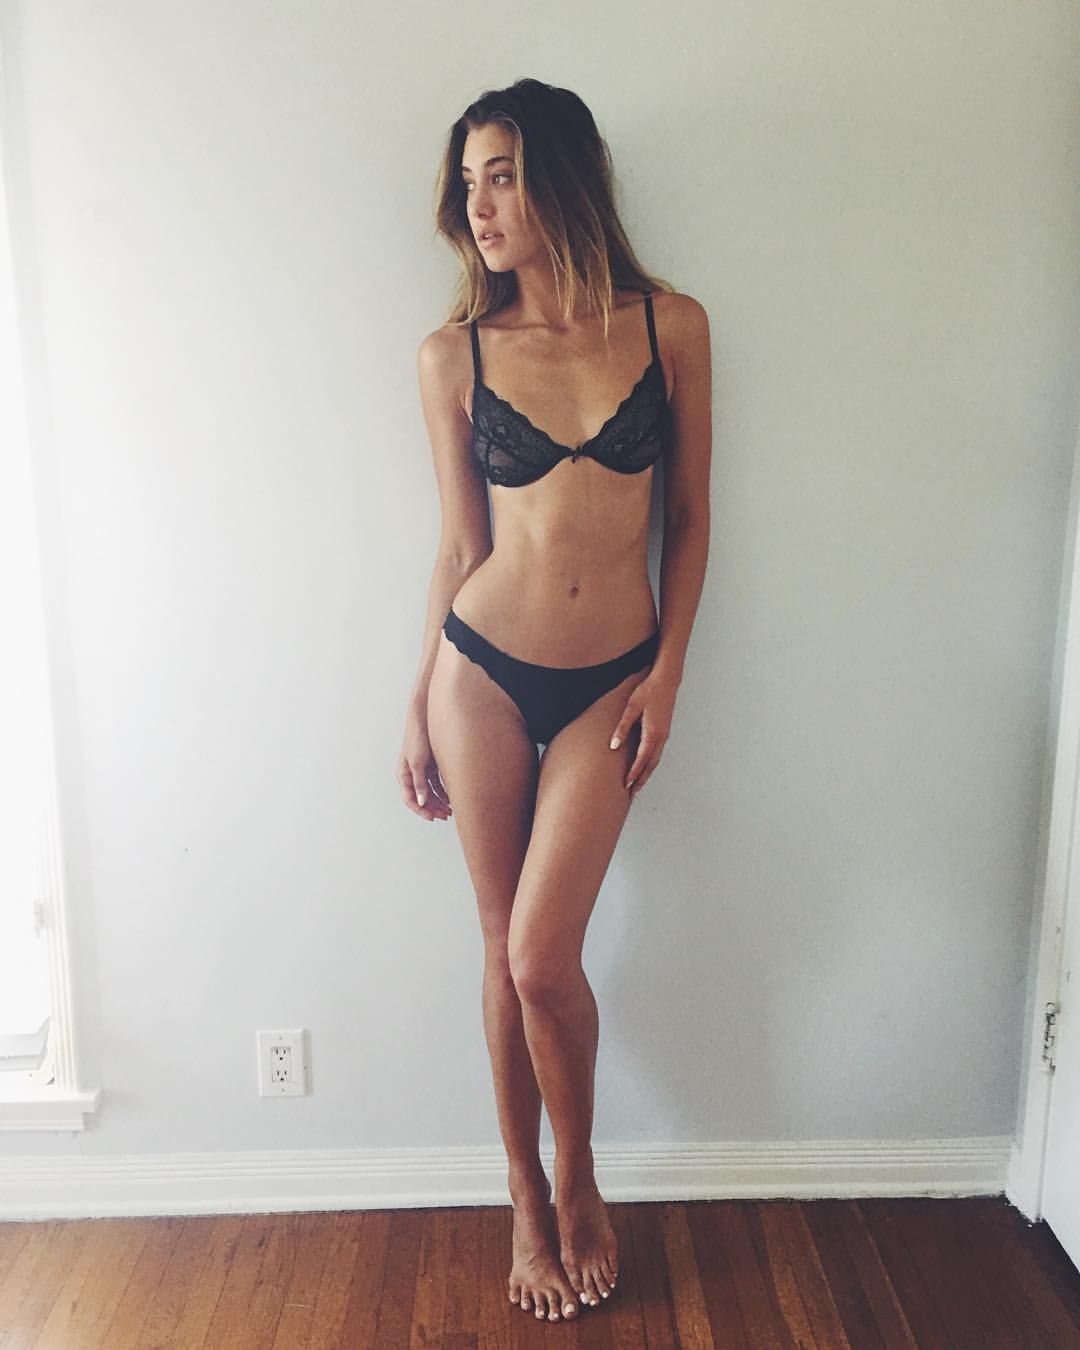 Hot Jessica Serfaty nudes (22 foto and video), Ass, Paparazzi, Feet, panties 2015